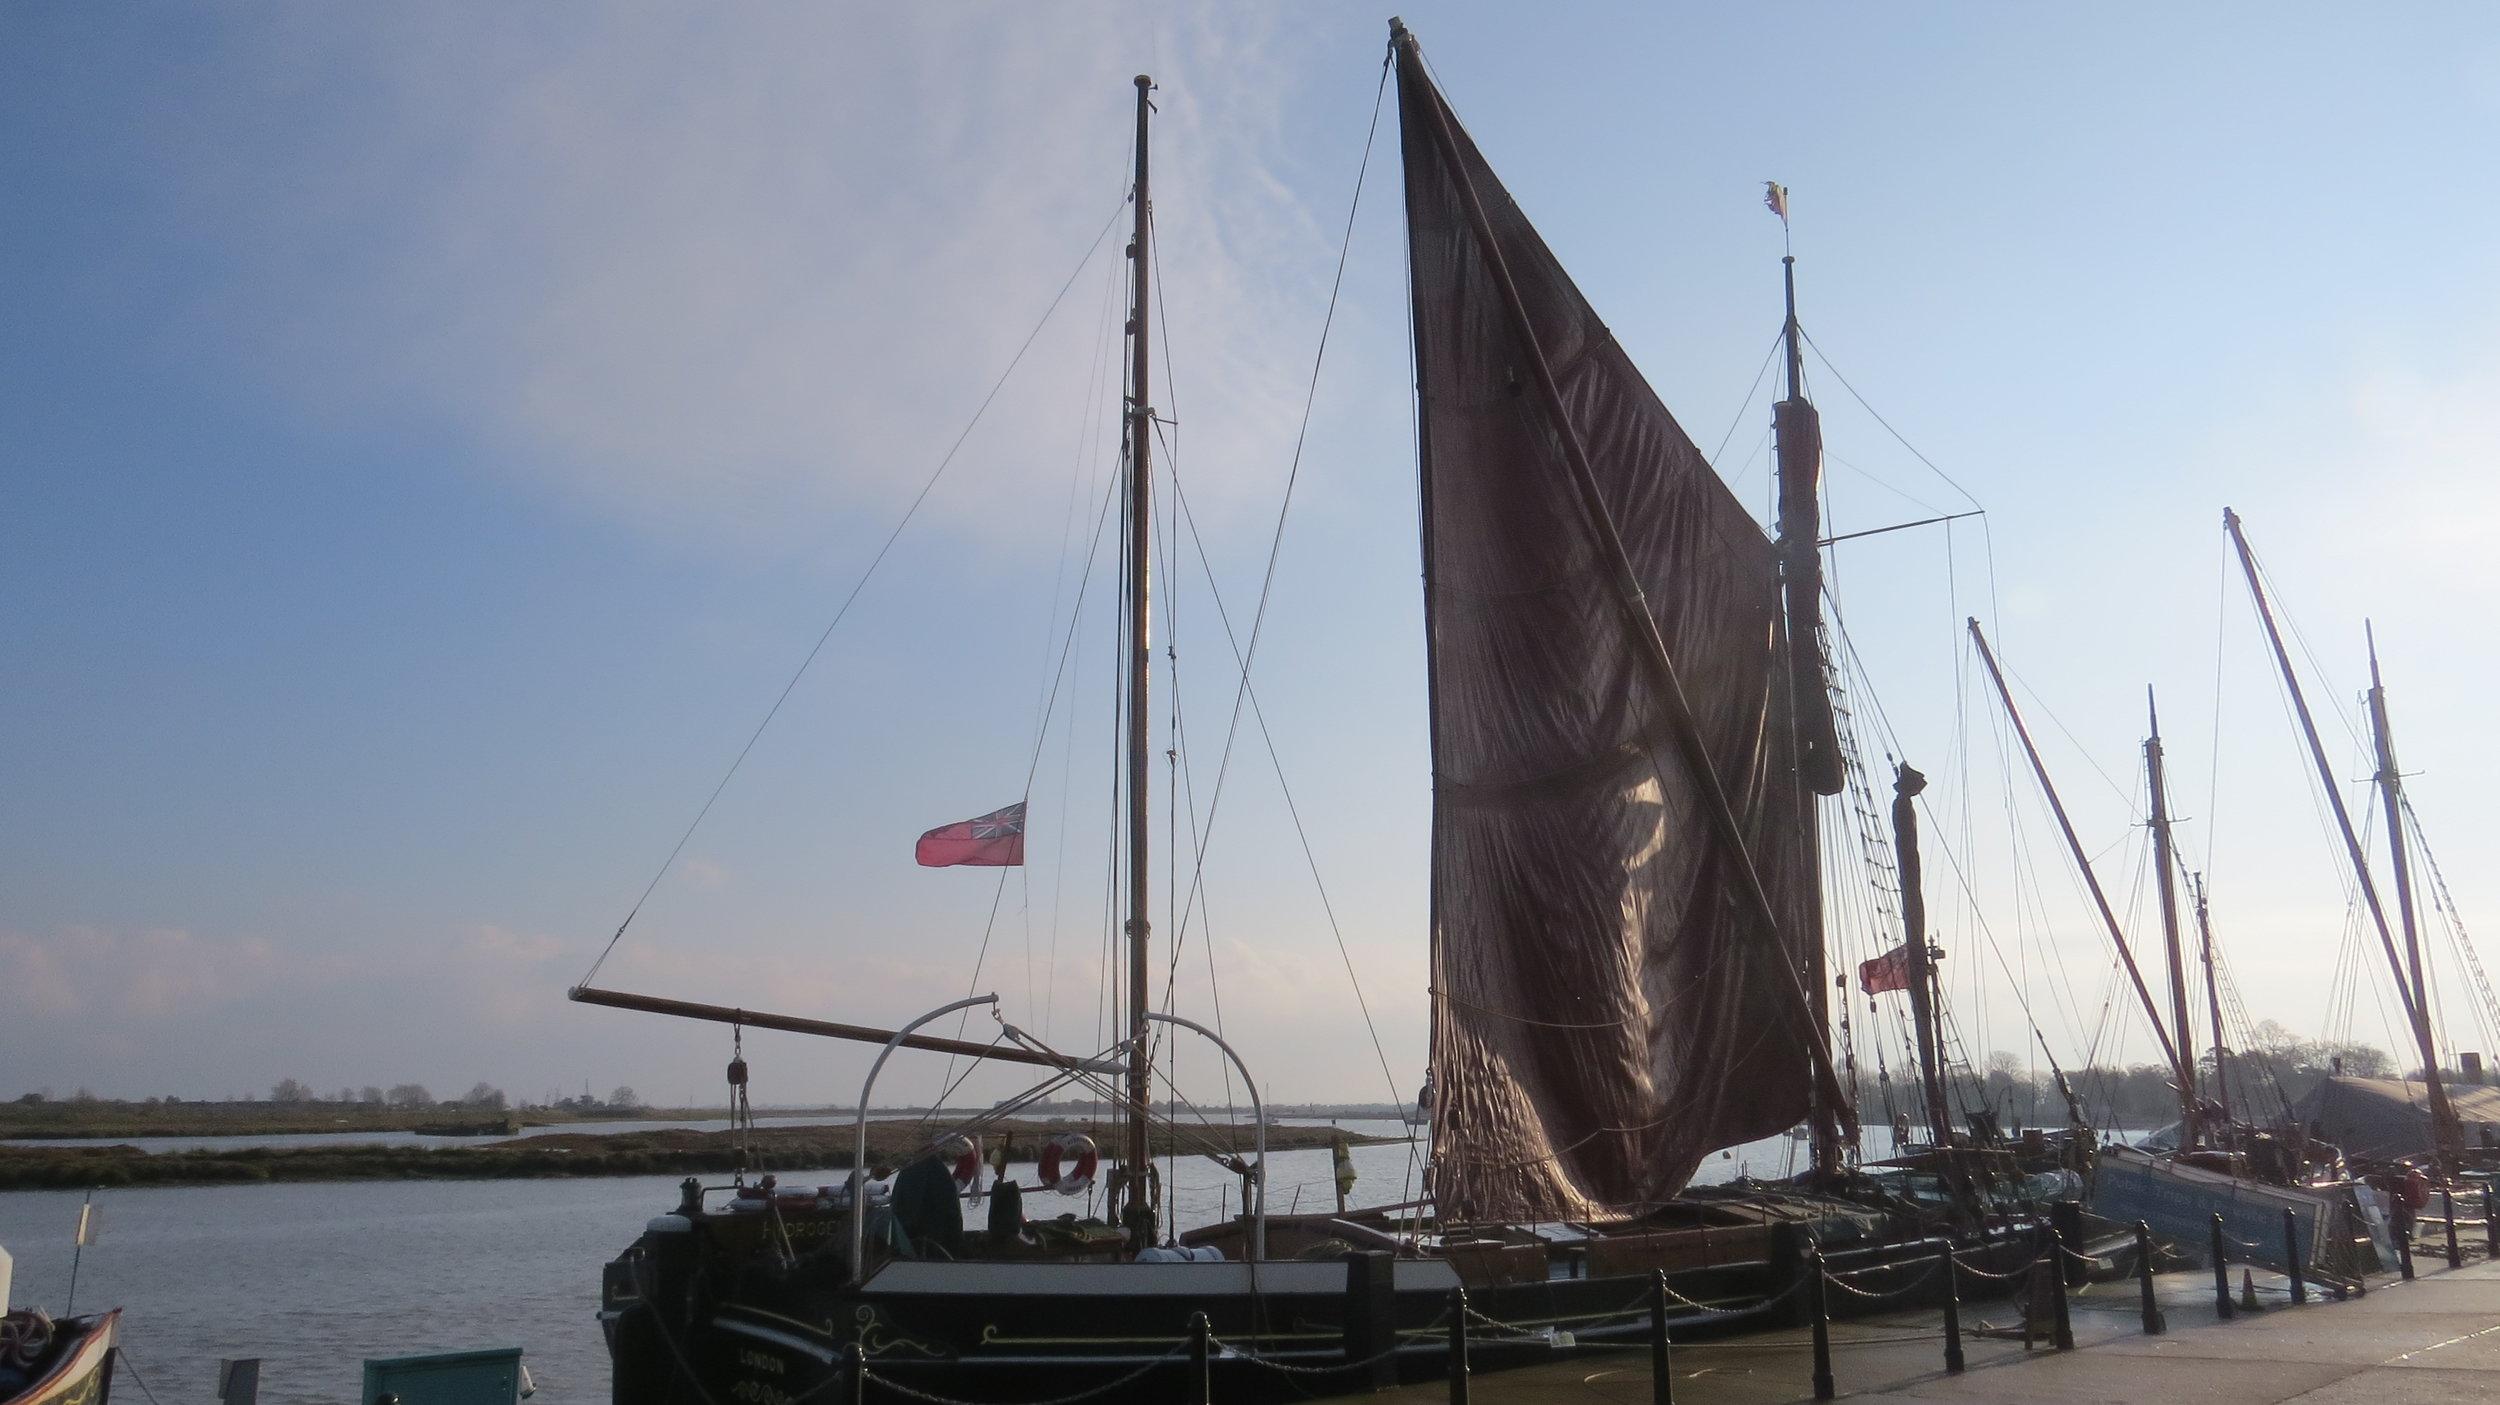 Thames Barge Maldon